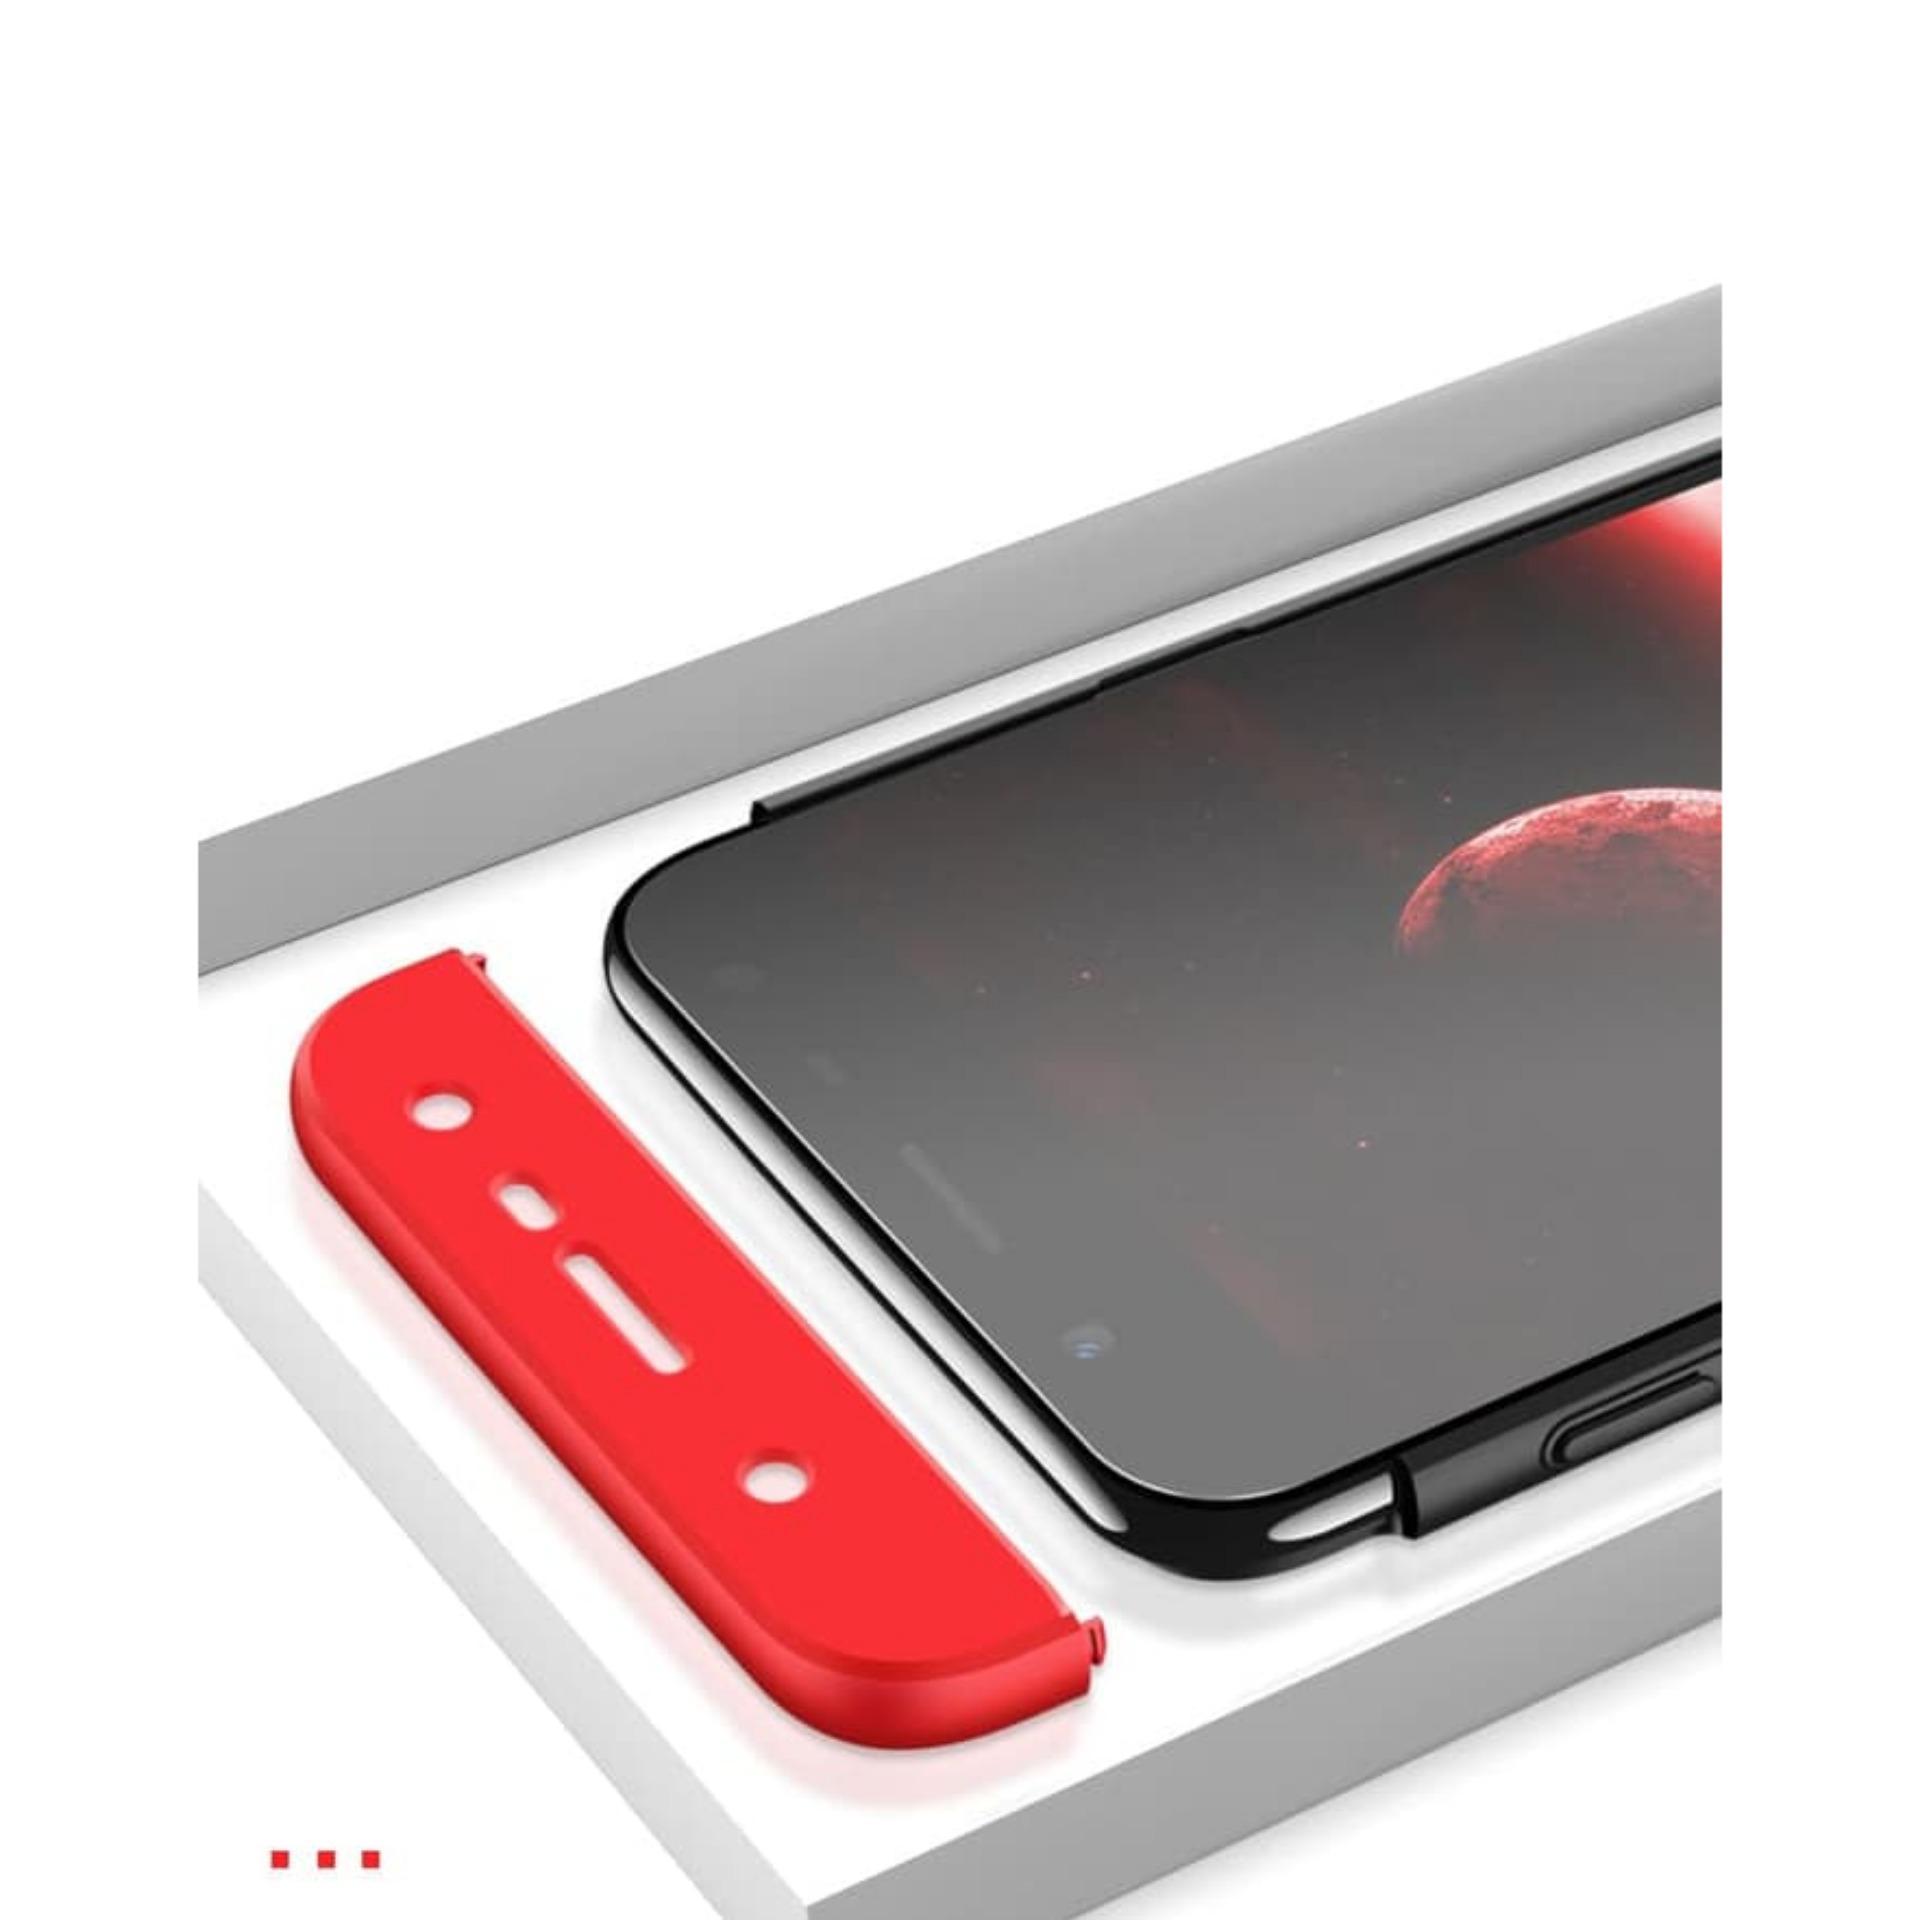 Review Blacksheep Samsung J7 Plus Full Cover Armor Baby Skin Hard Galaxy Lte 16gb Hitam Case